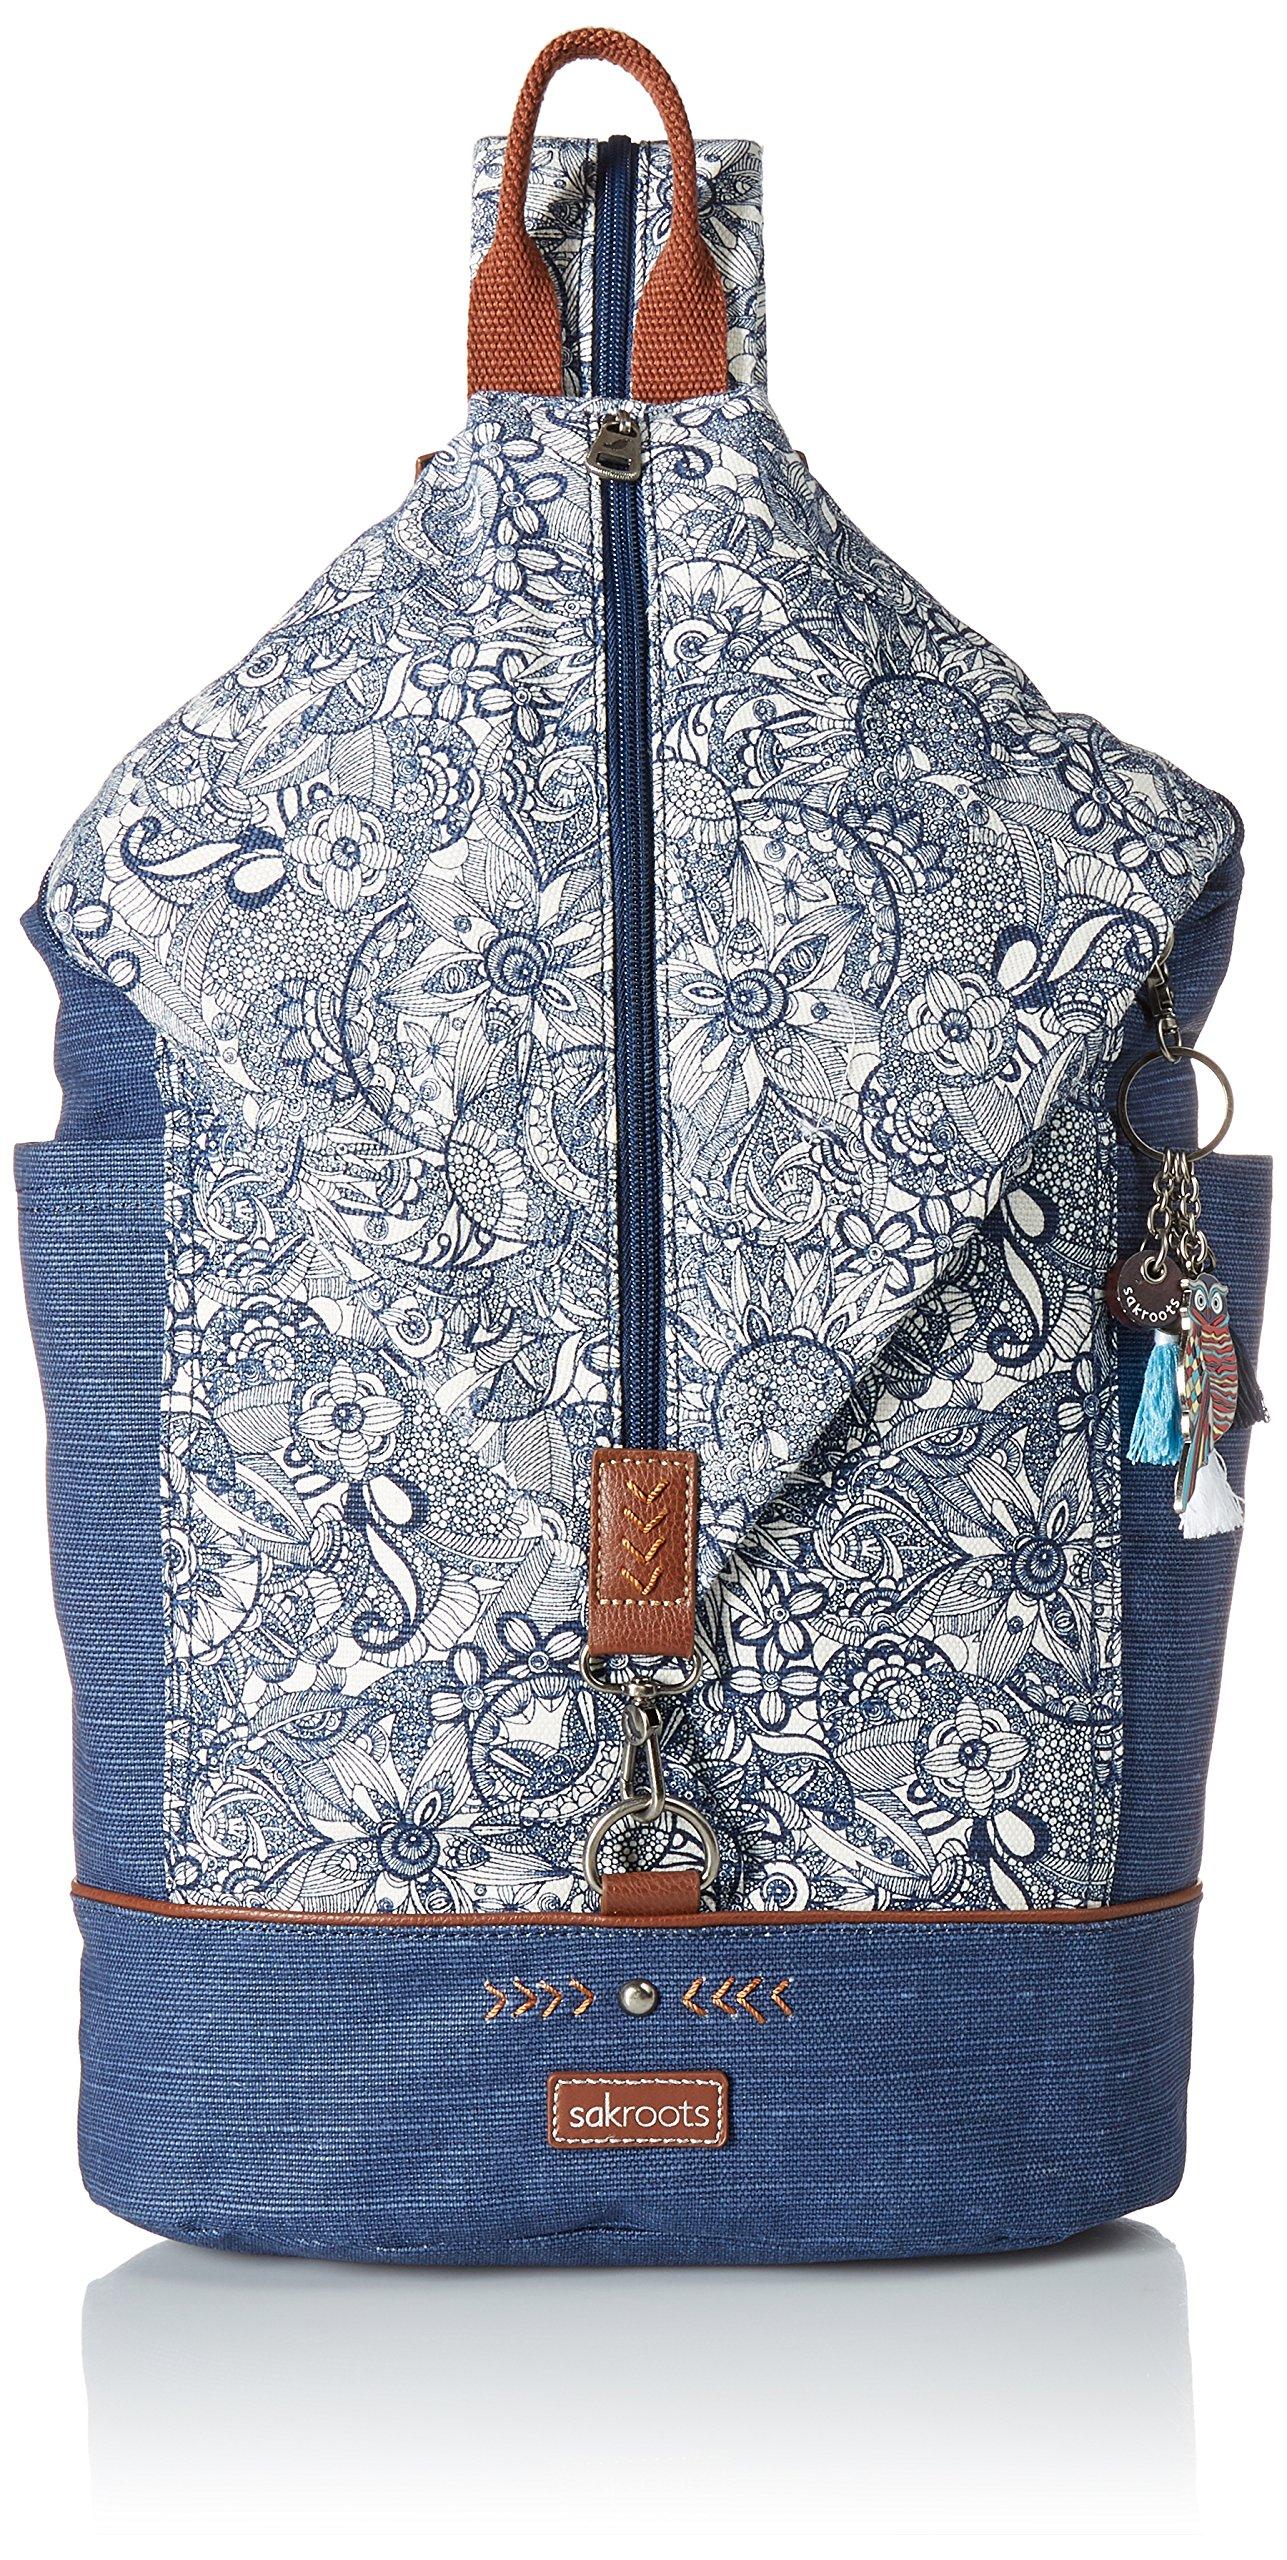 Sakroots City Backpack, Navy Spirit Desert, One Size